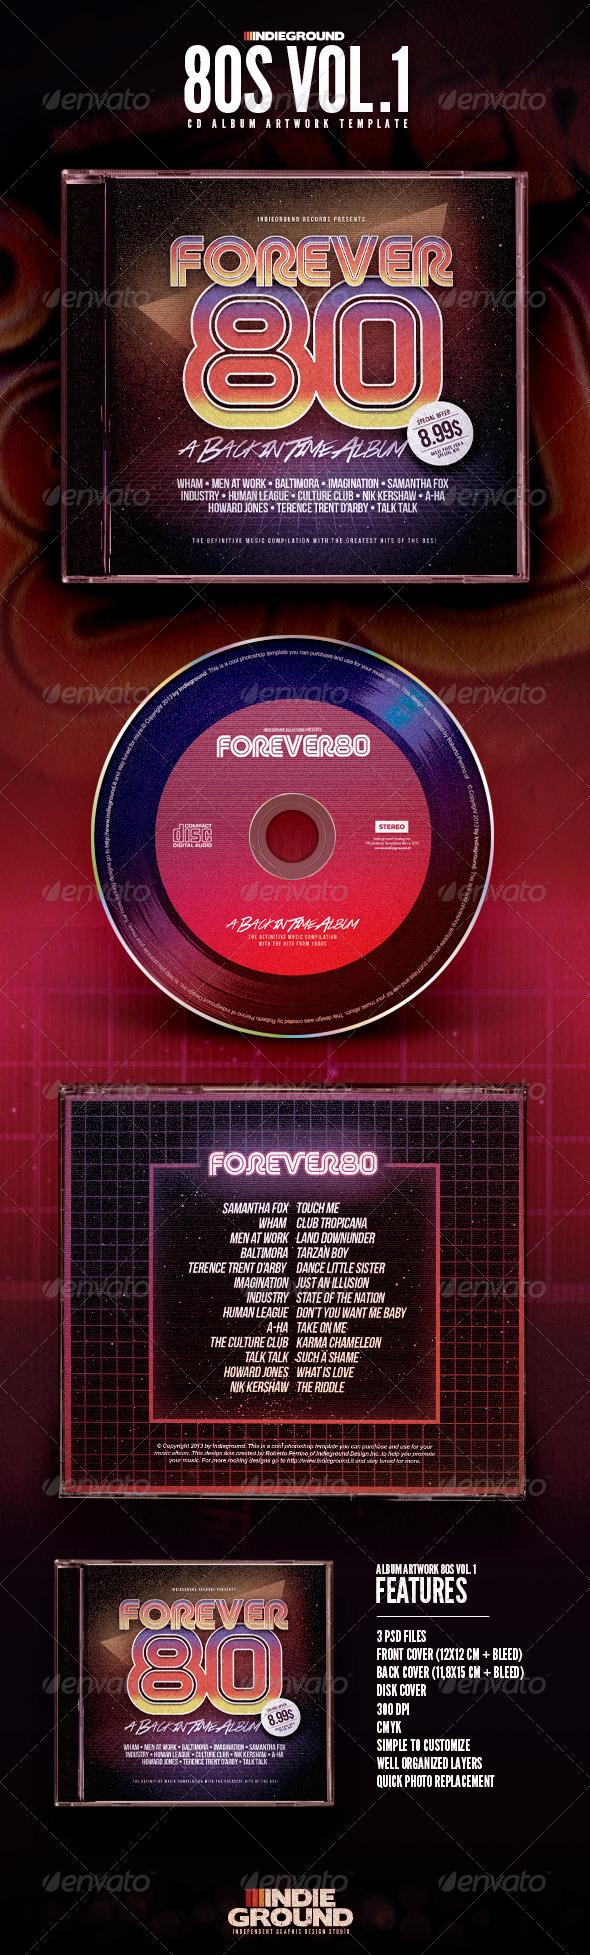 GraphicRiver 80s CD Album Artwork 6635651